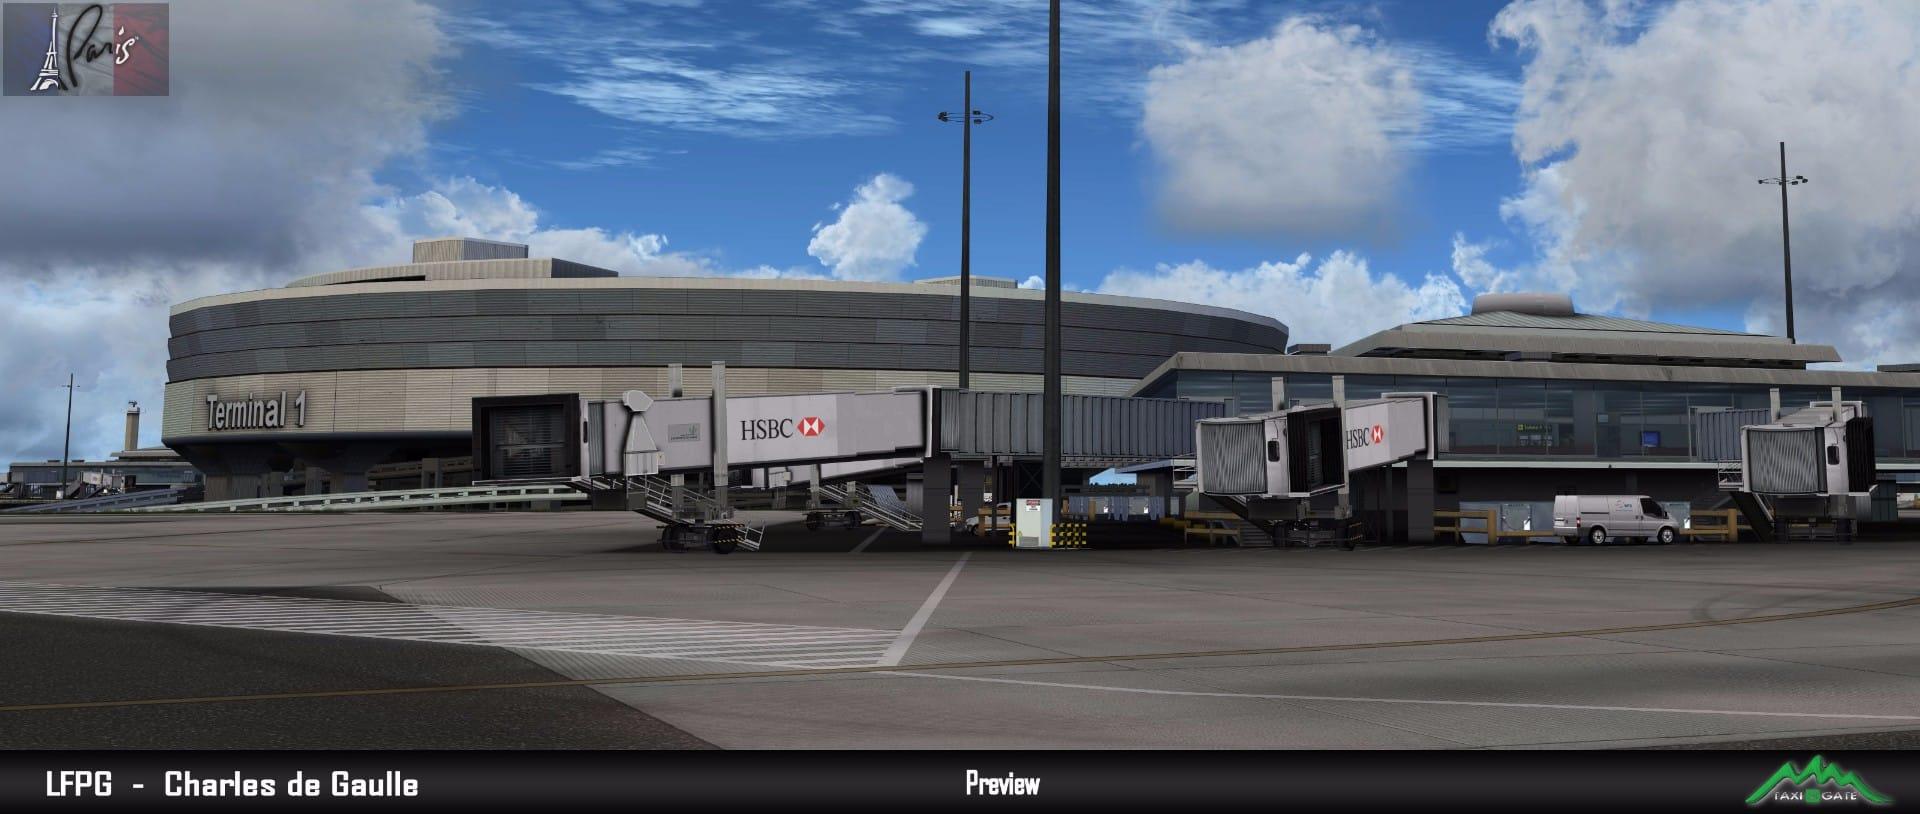 Taxi2Gate – Paris CDG Terminal 1 preview